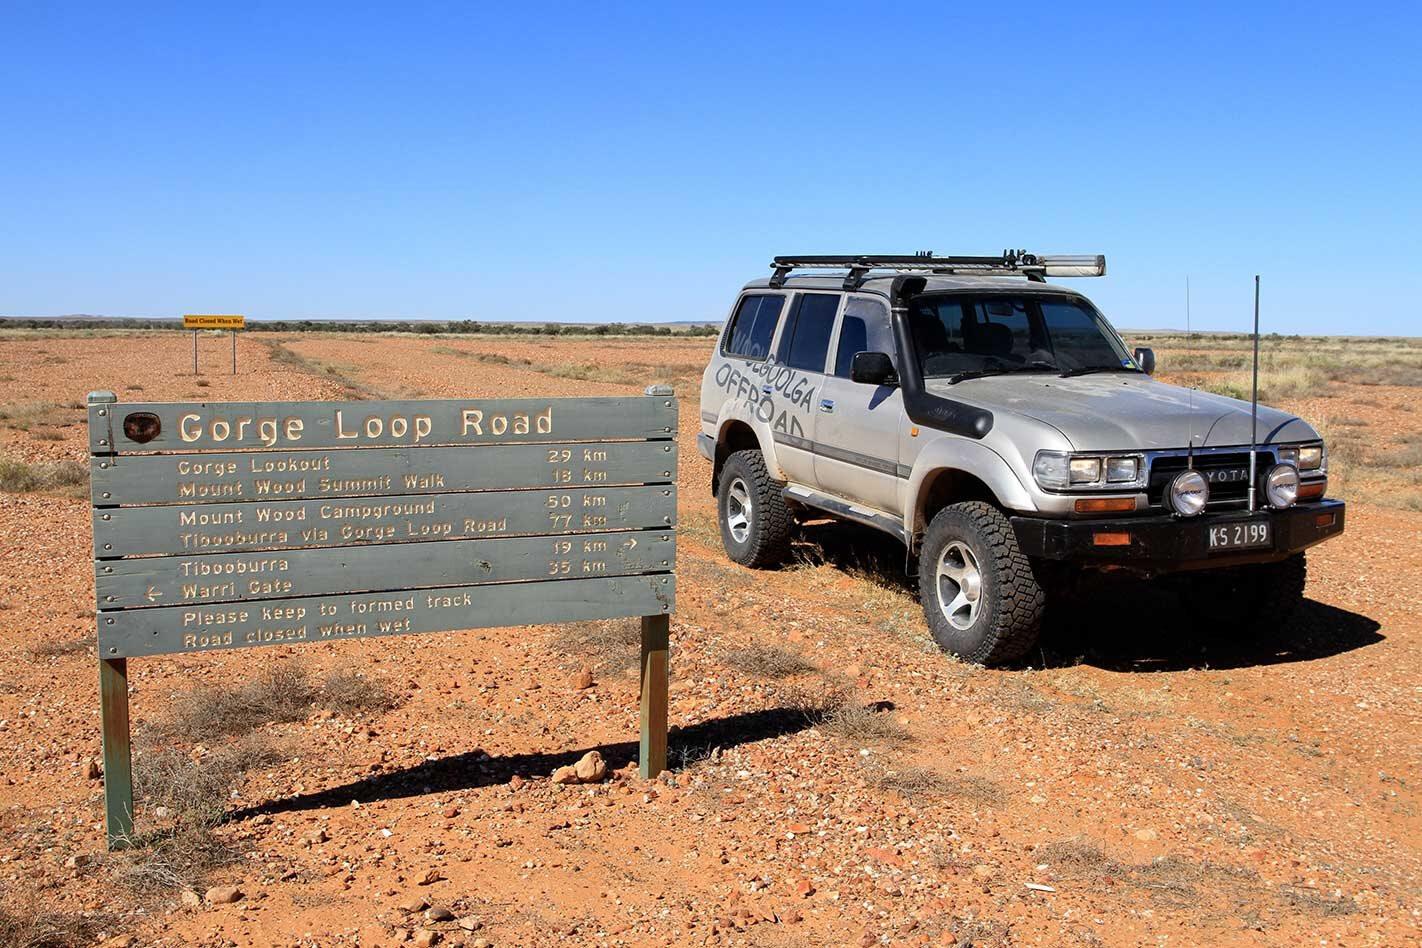 4x4 trip through the Tibooburra Gorge loop drive NSW